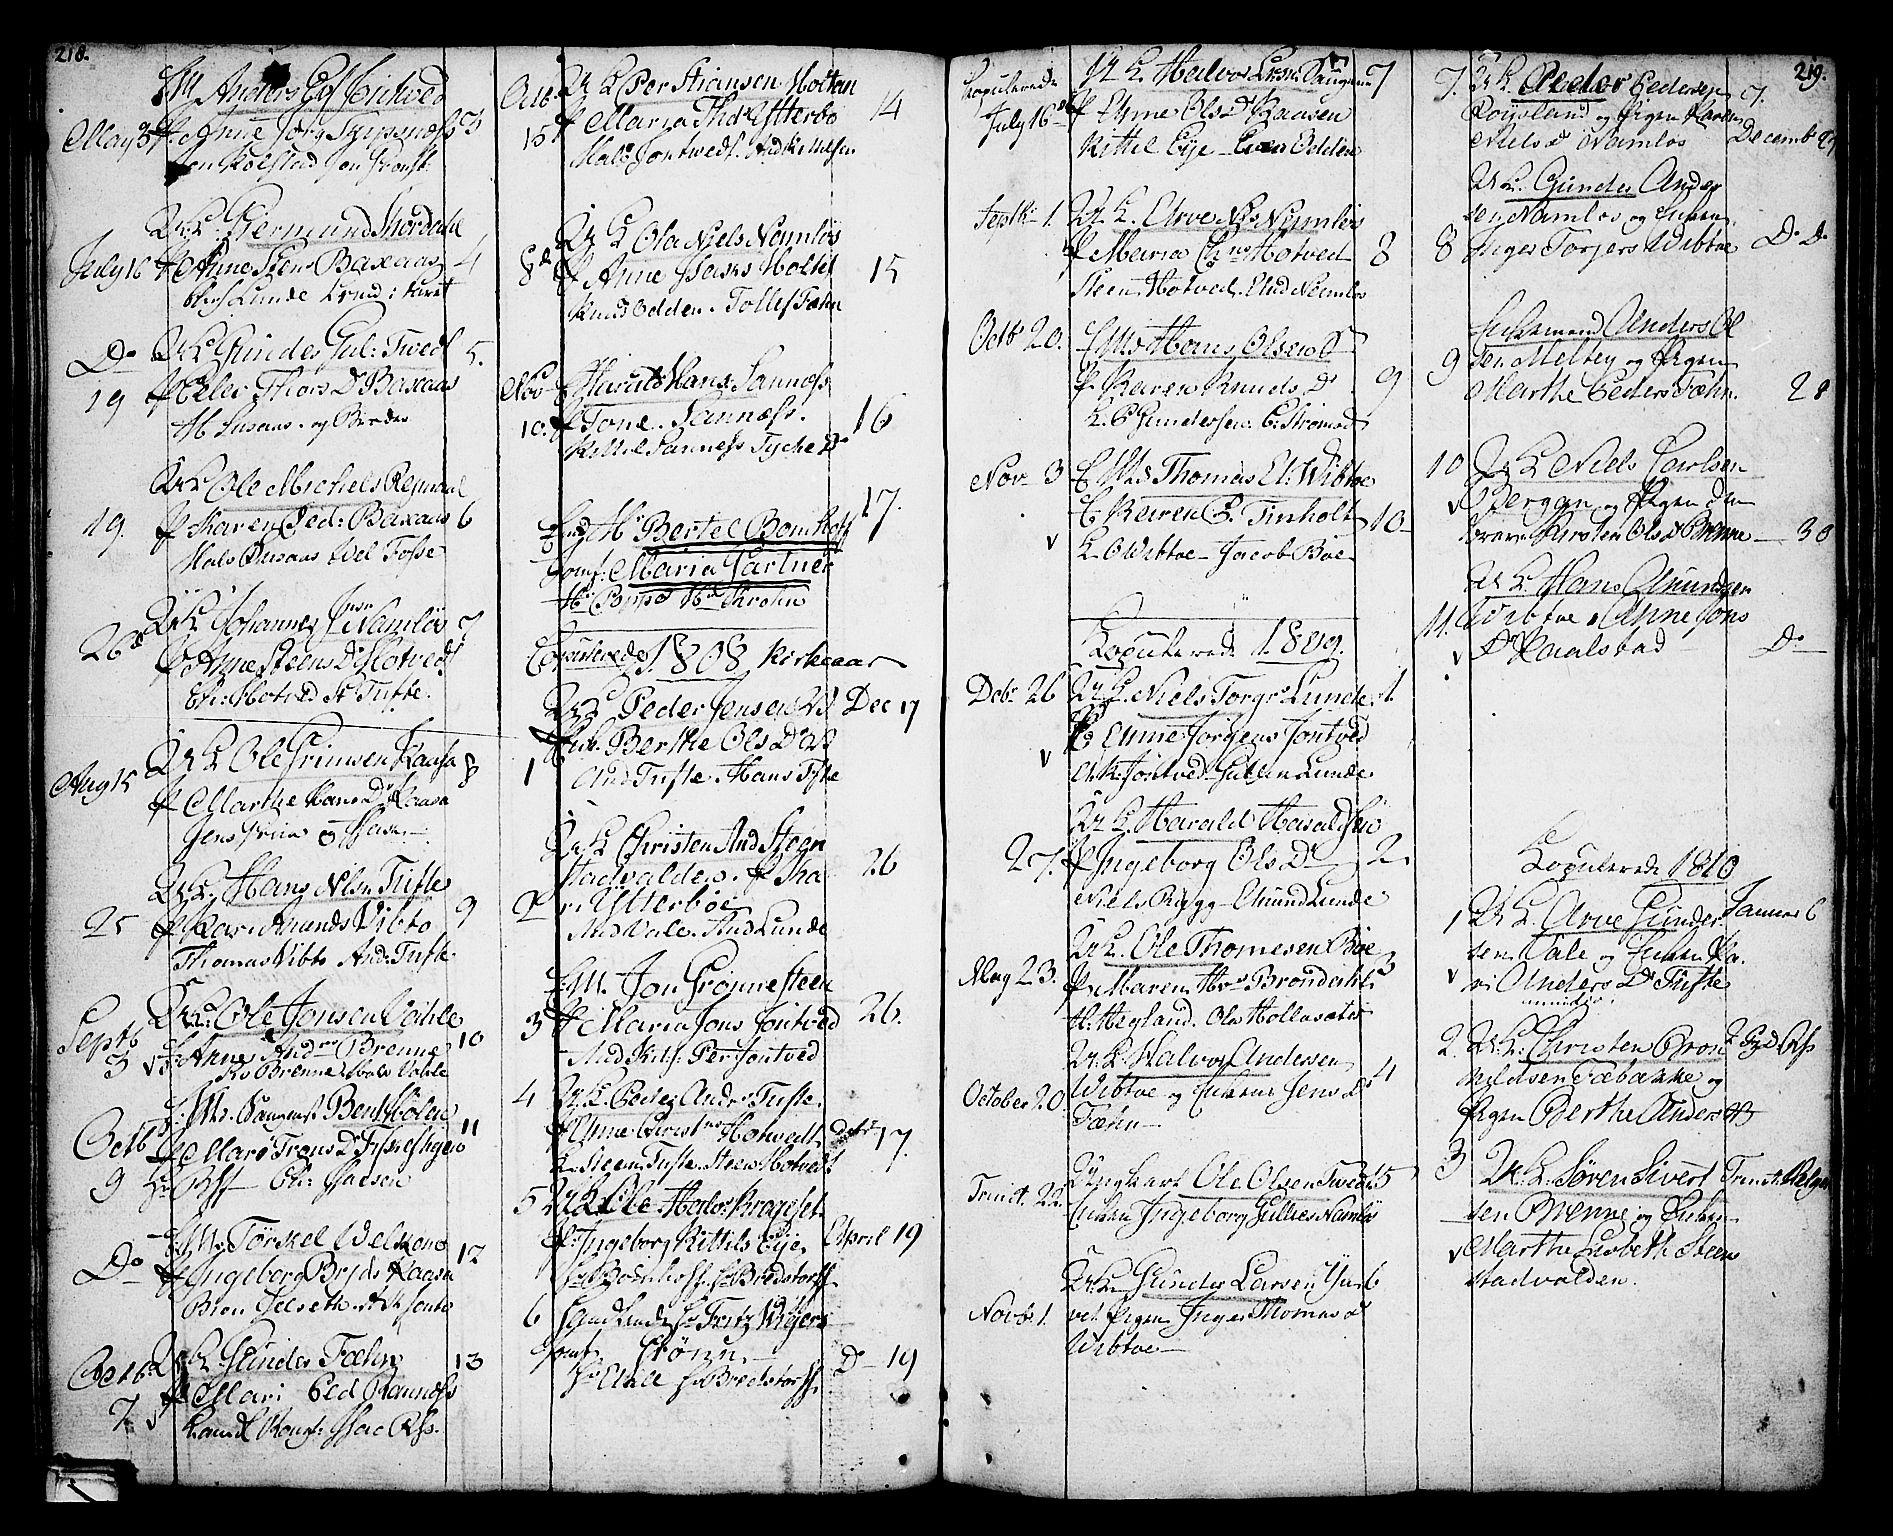 SAKO, Holla kirkebøker, F/Fa/L0002: Ministerialbok nr. 2, 1779-1814, s. 218-219